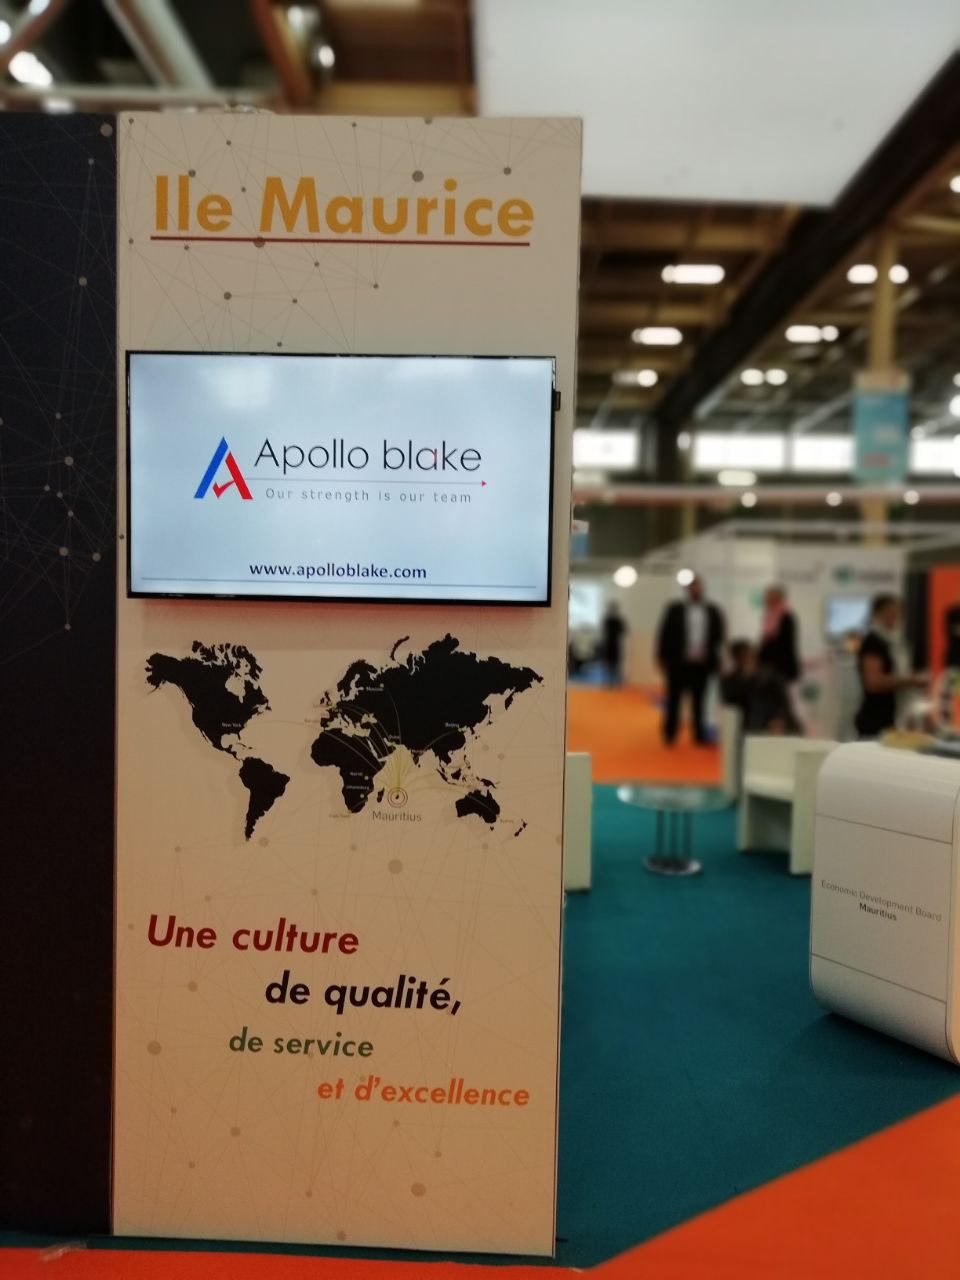 Apollo blake at SECA salon Paris  |   Apollo blake à Paris – Salon SECA 2018